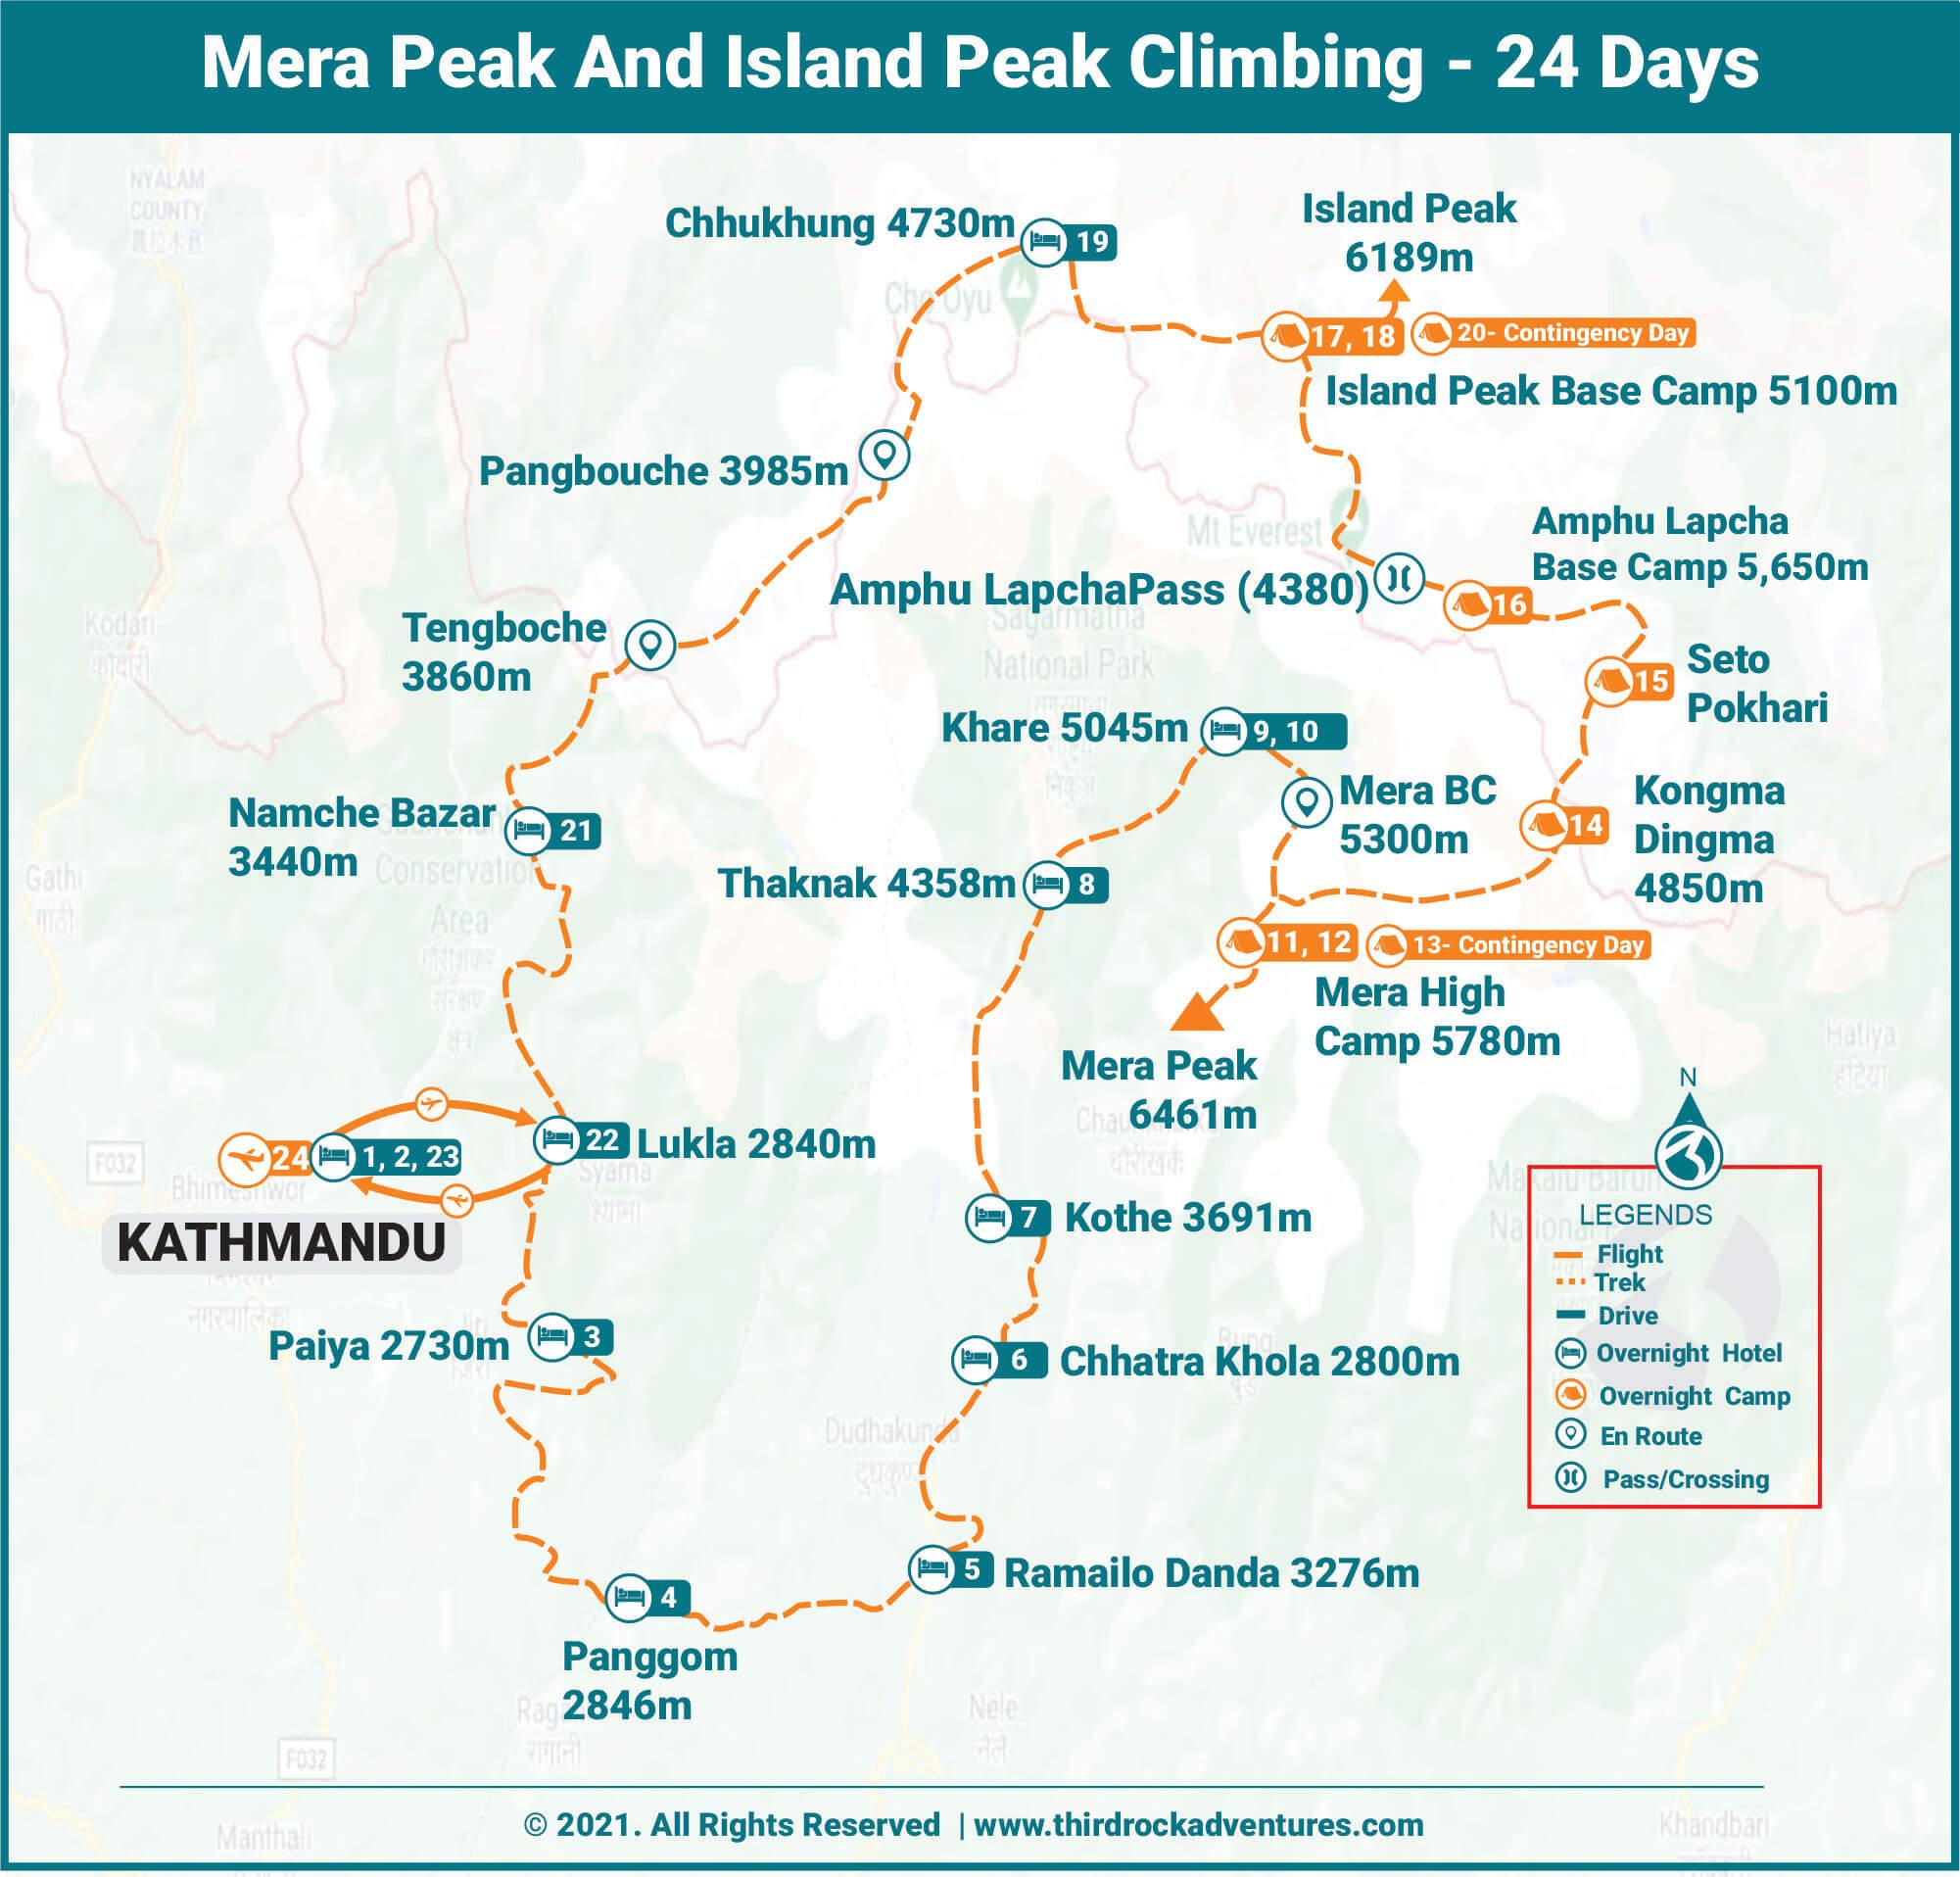 Mera Peak And Island Peak Climbing - 24 Days Route Map